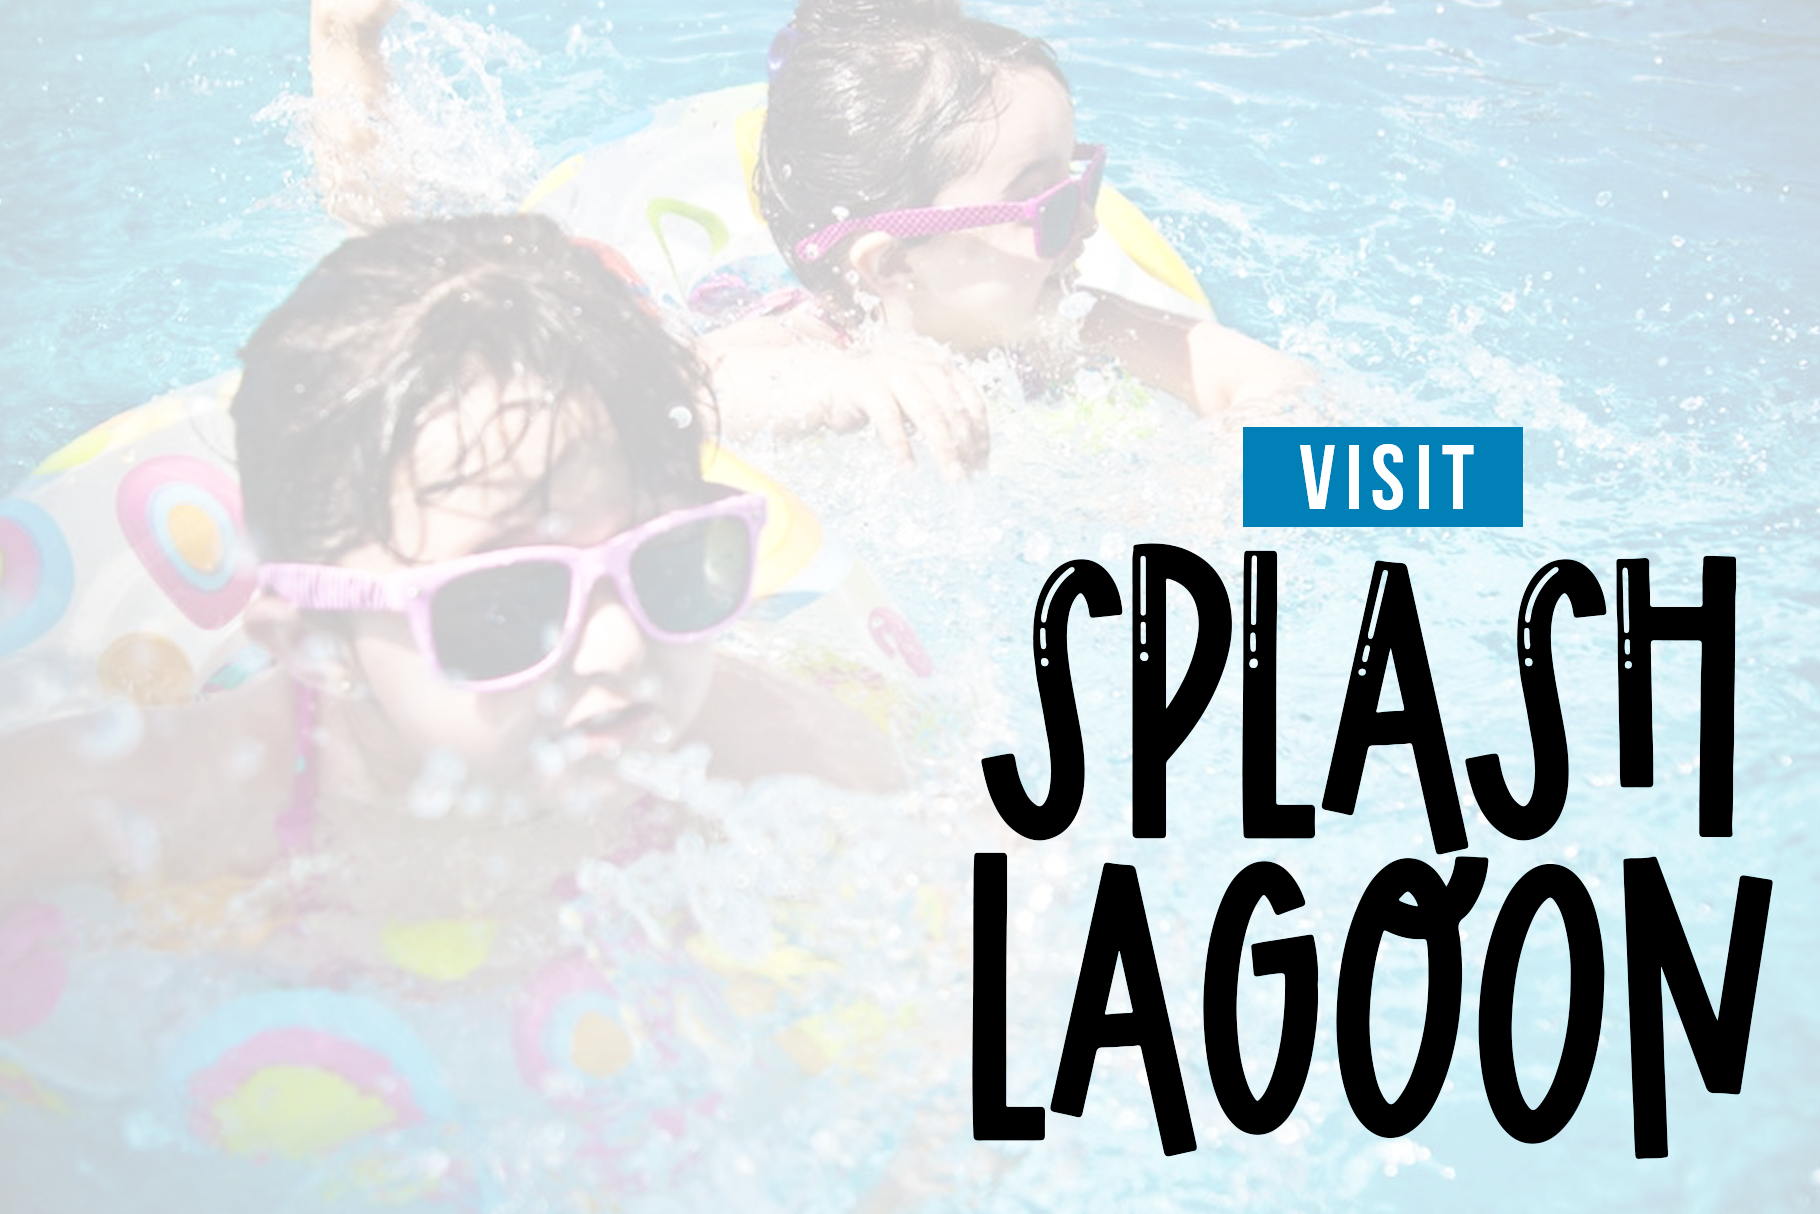 Lagoon - A Fun Handwritten Font example image 5